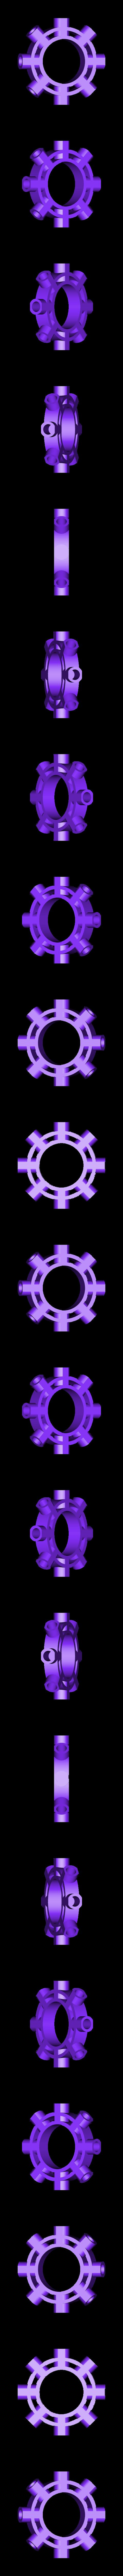 spinner_handwheel_29.stl Download free STL file Handwheel Spinner • Object to 3D print, bda